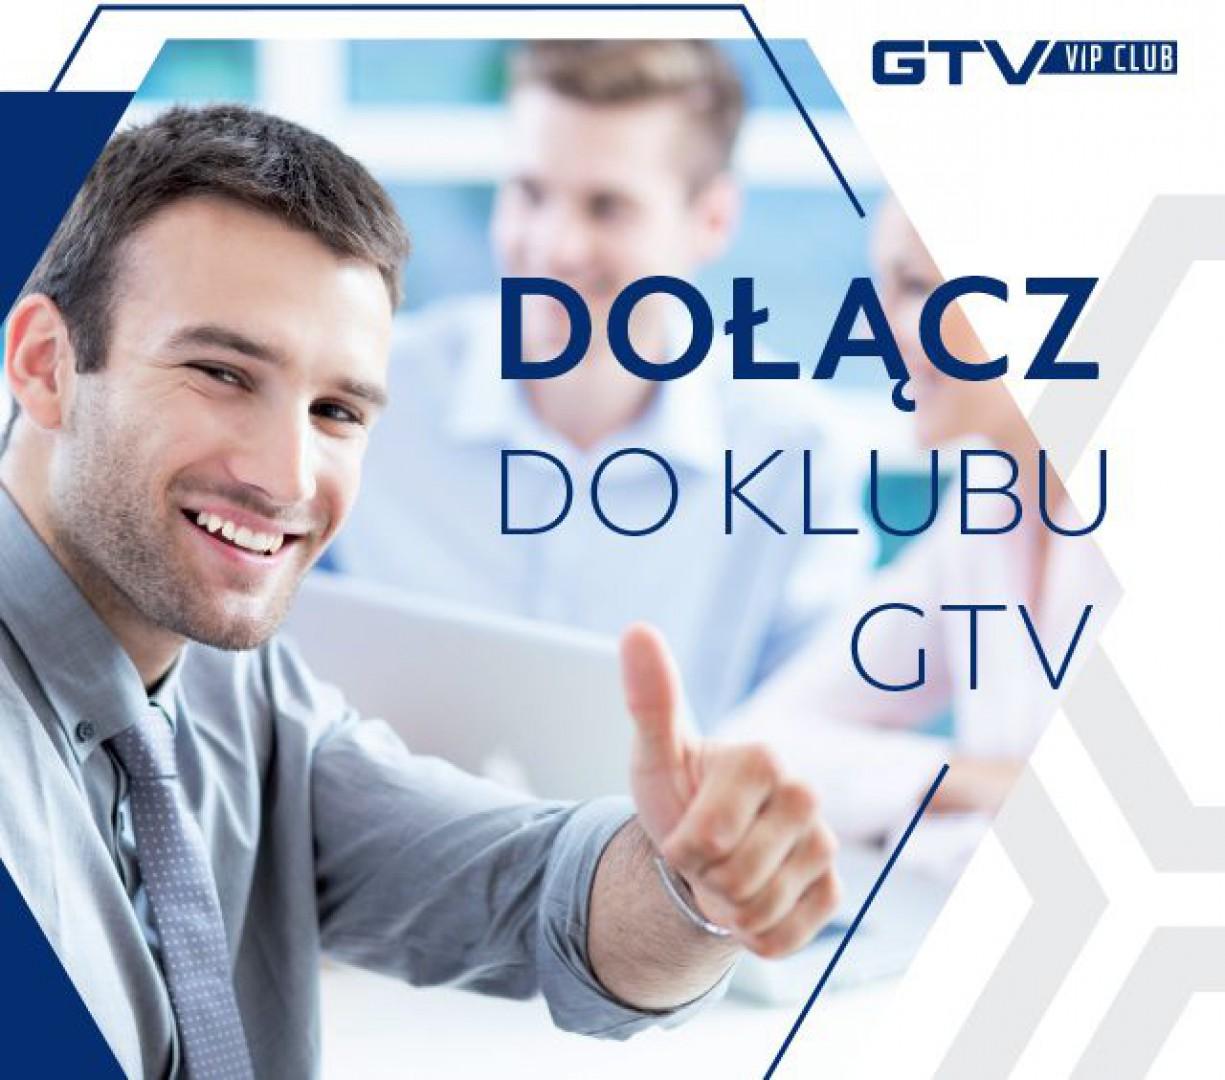 Plakat promujący GTV VIP CLUB. Fot. GTV